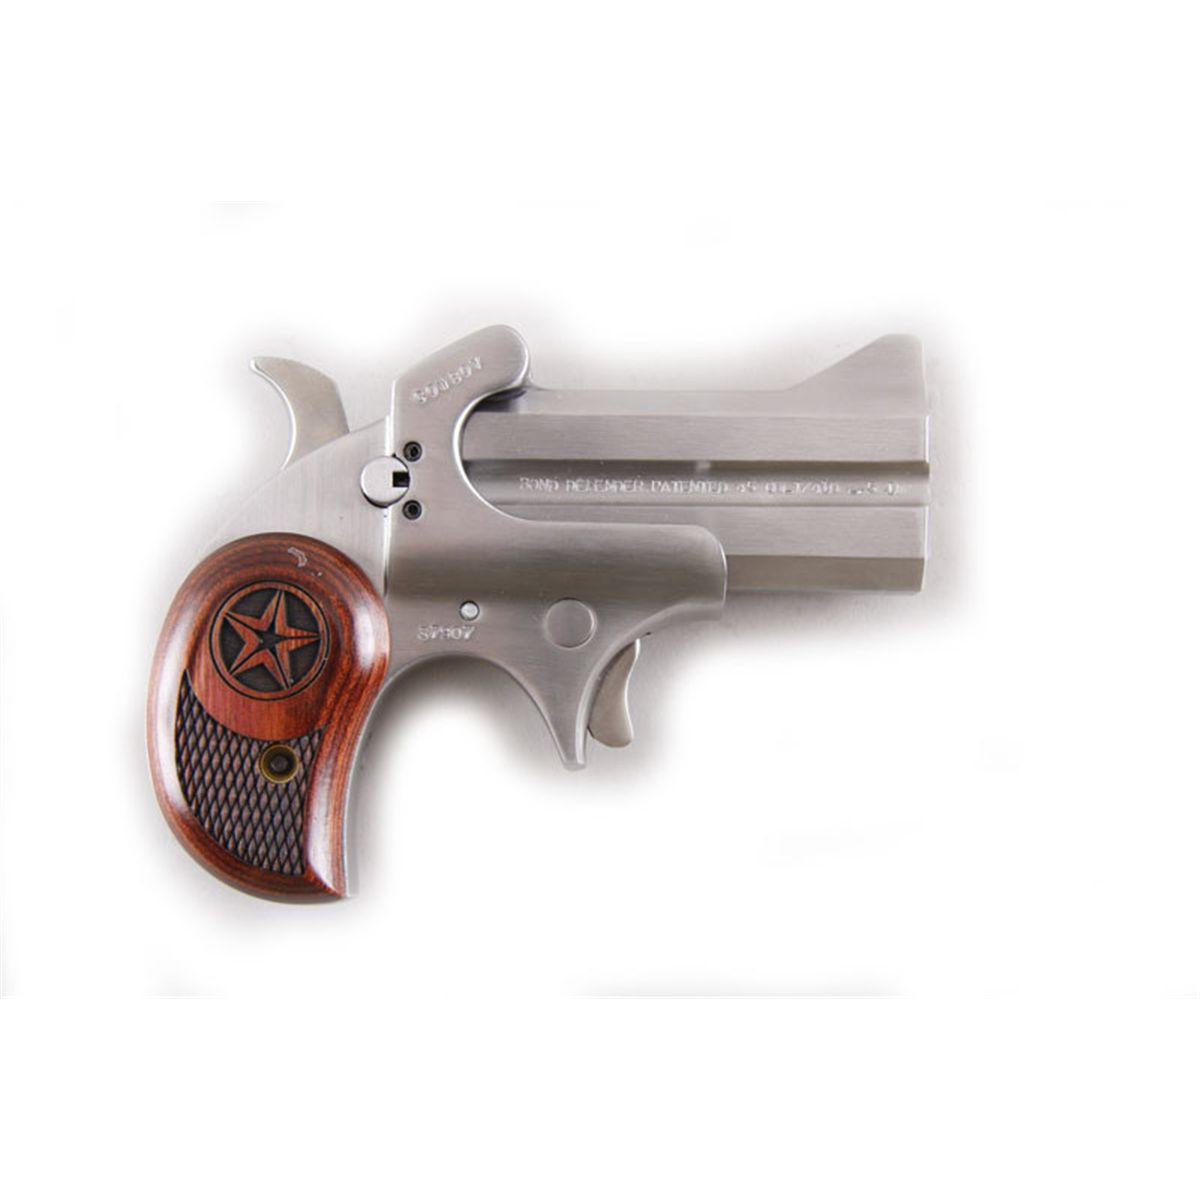 Bond Arms Cowboy Defender Cal  45LC/ 410 SN:37907, Double barrel derringer  style pistol that shoots